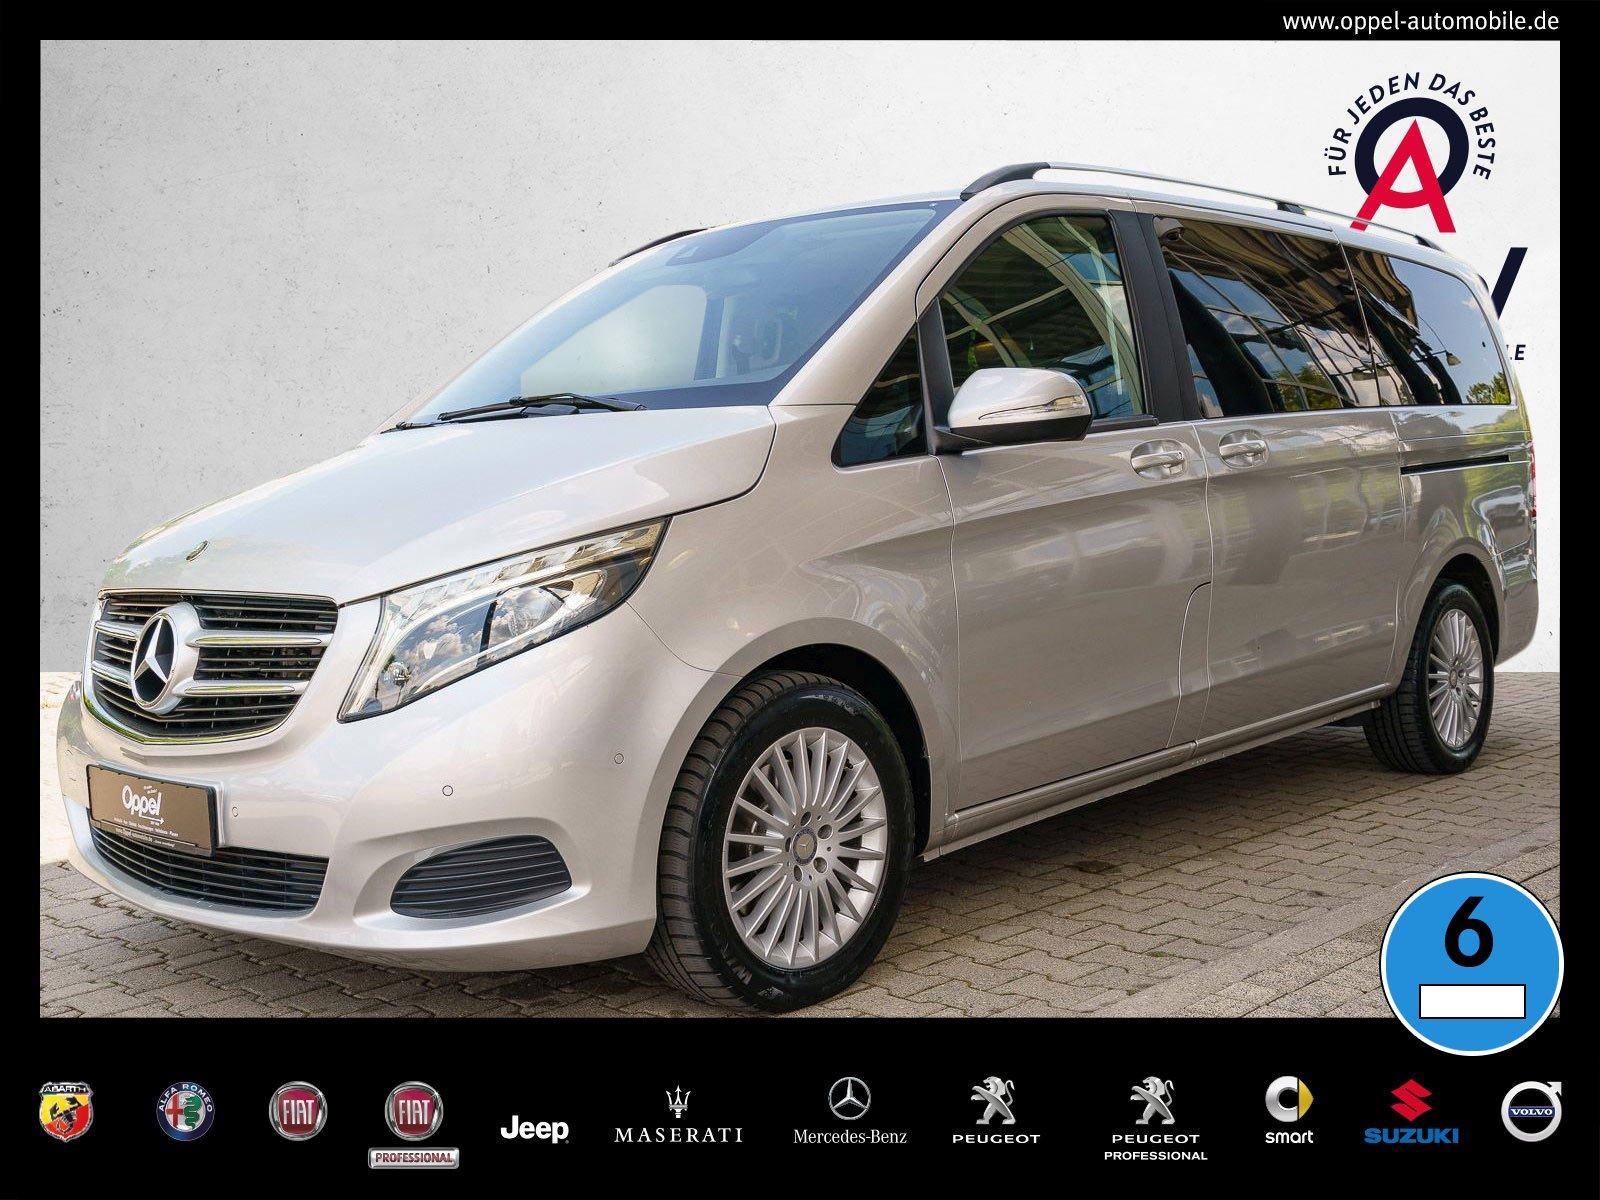 Mercedes-Benz V 220 d EDITION Lang NAVI+LED+AHK+TEMPO.+SITZHZ., Jahr 2016, Diesel